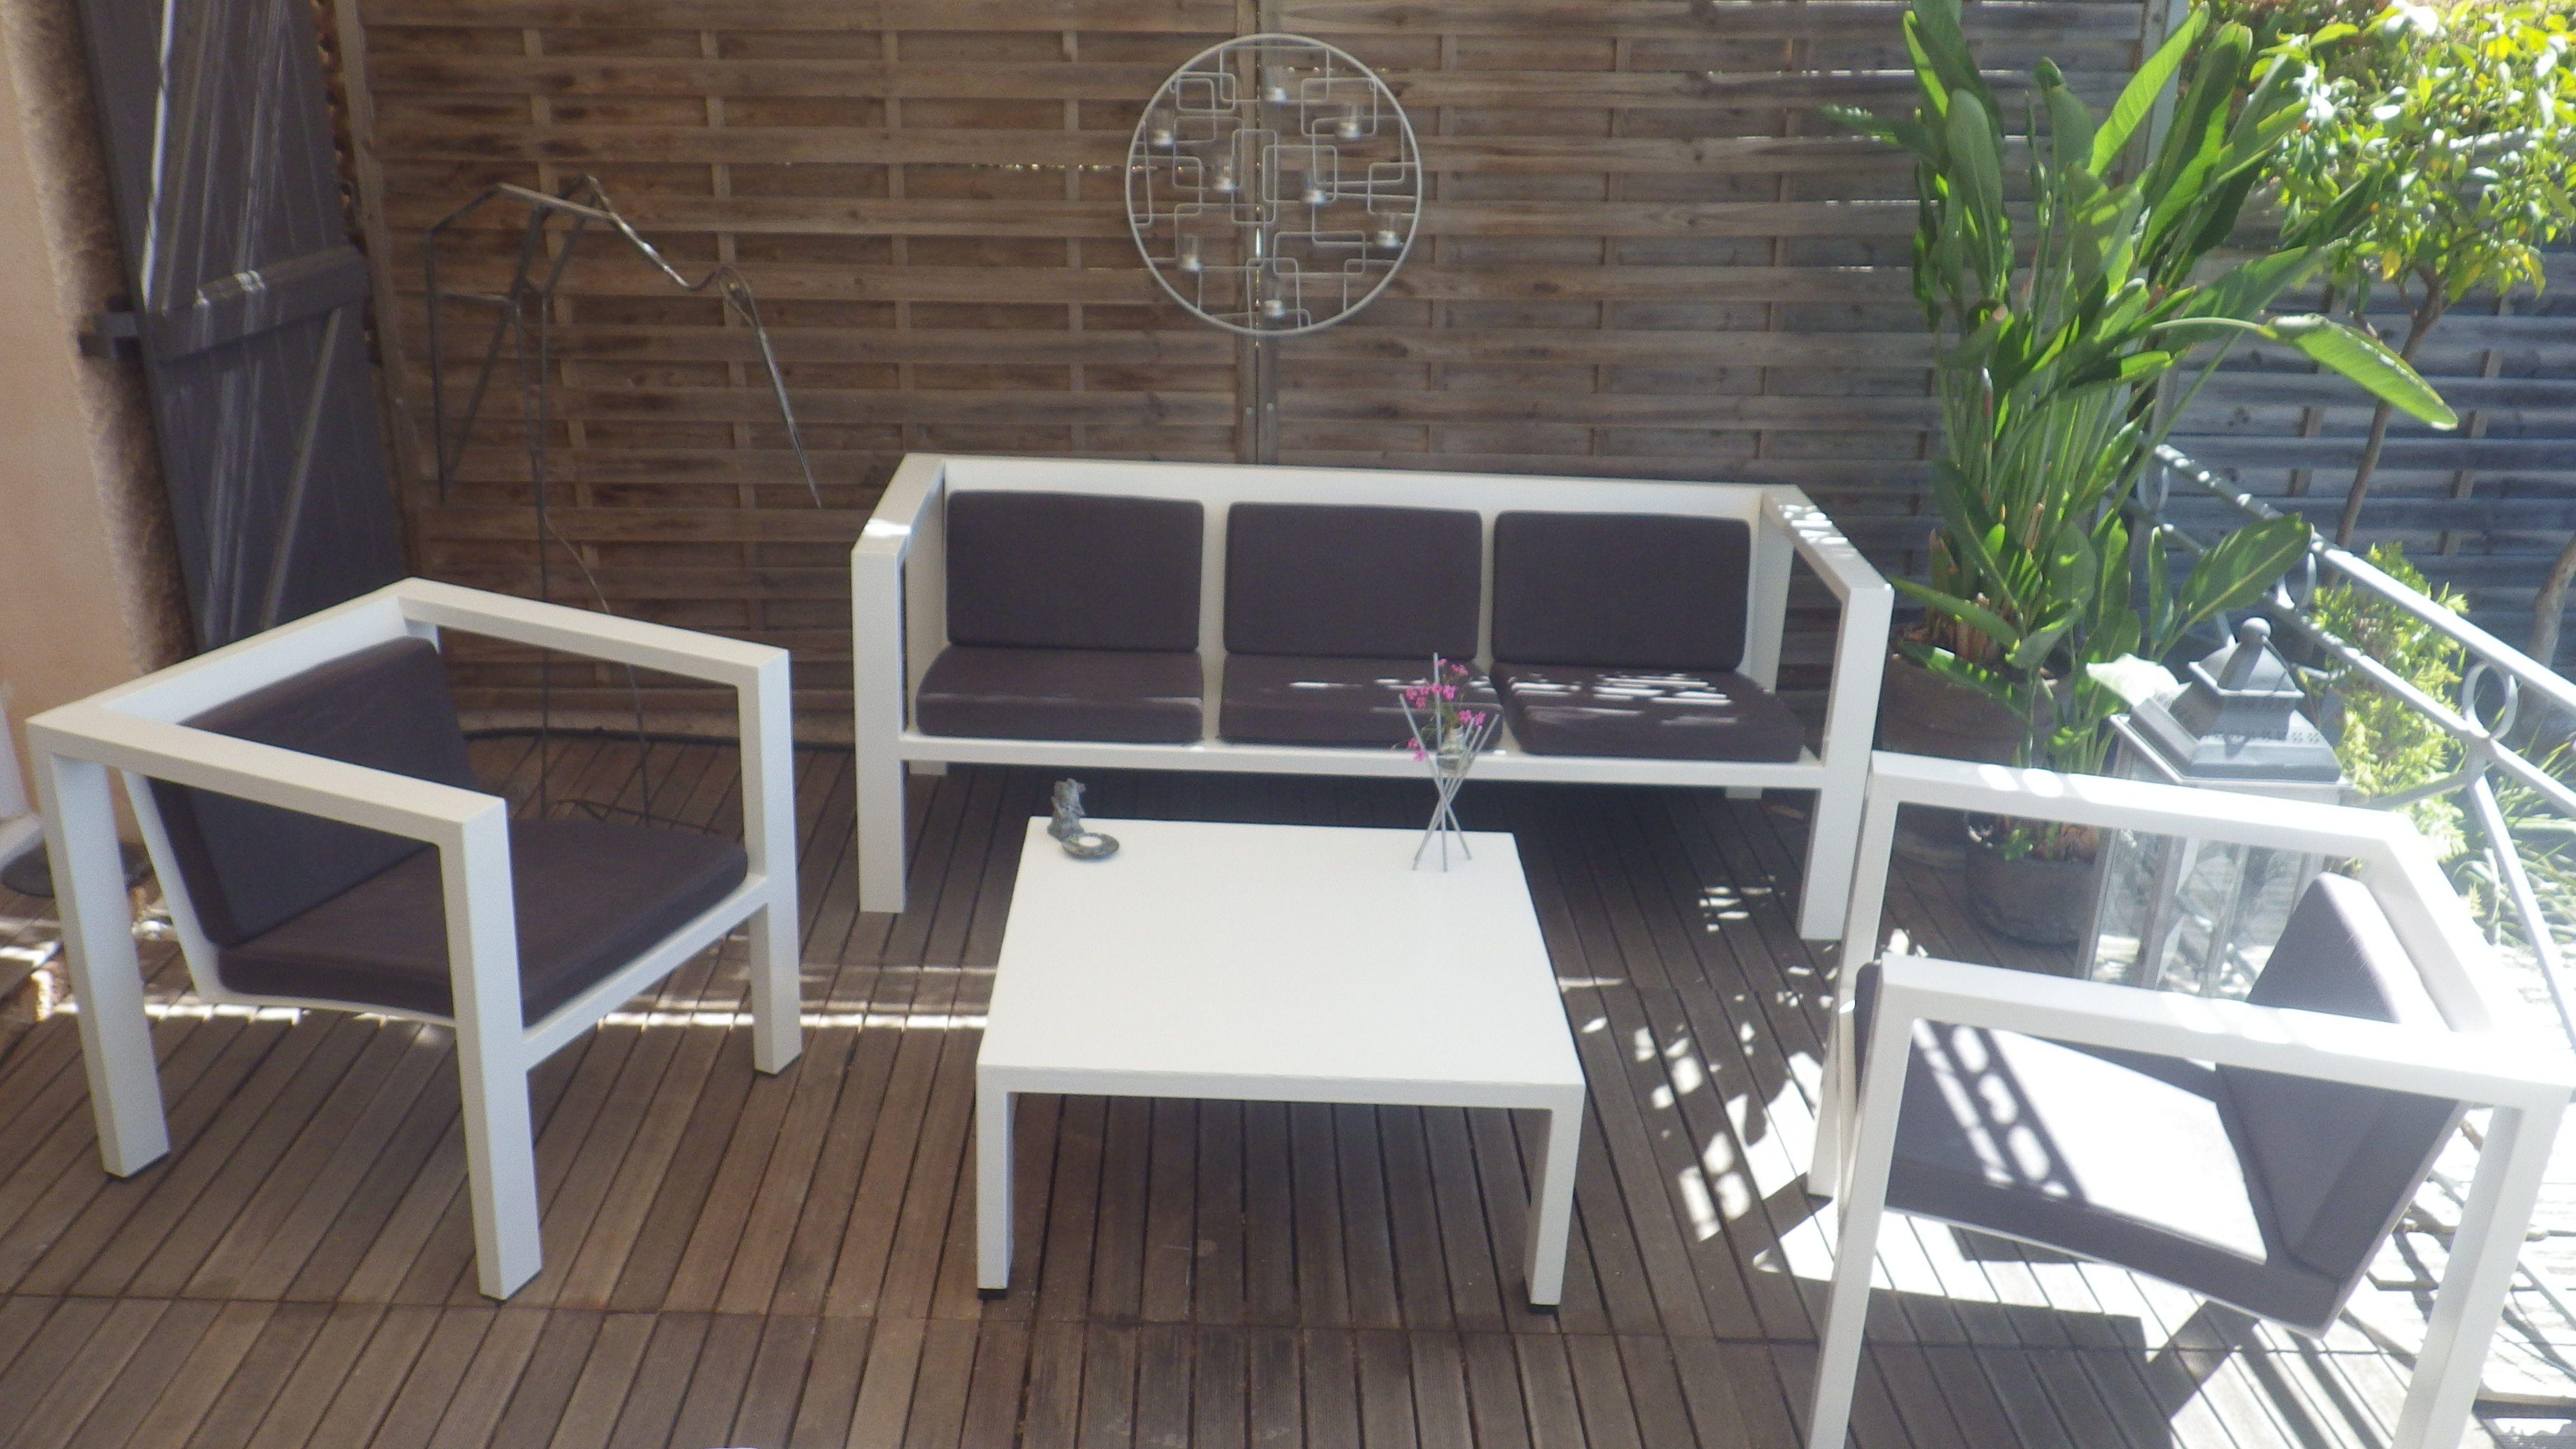 salon de jardin acier blanc designacier.com | Mobilier de ...